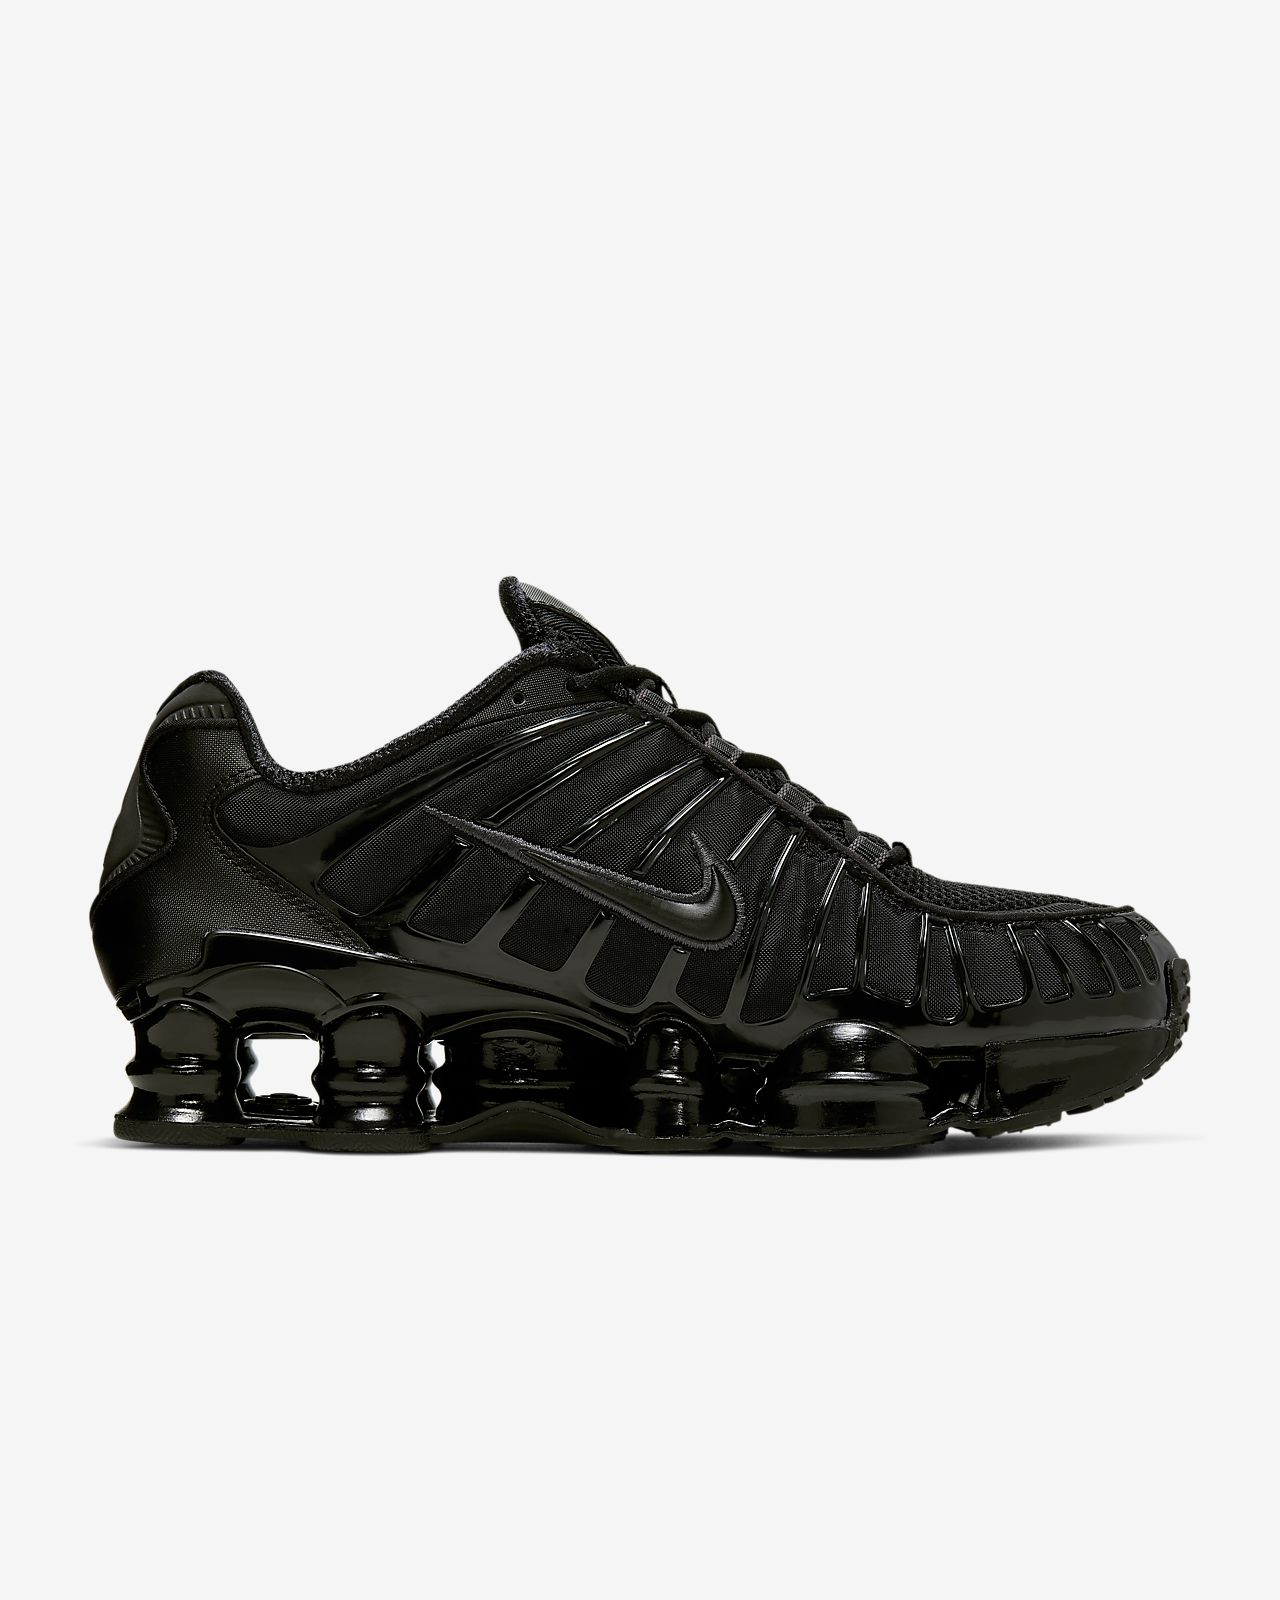 Shox Homme Pour Chaussure Nike Tl JuTc3FlK1